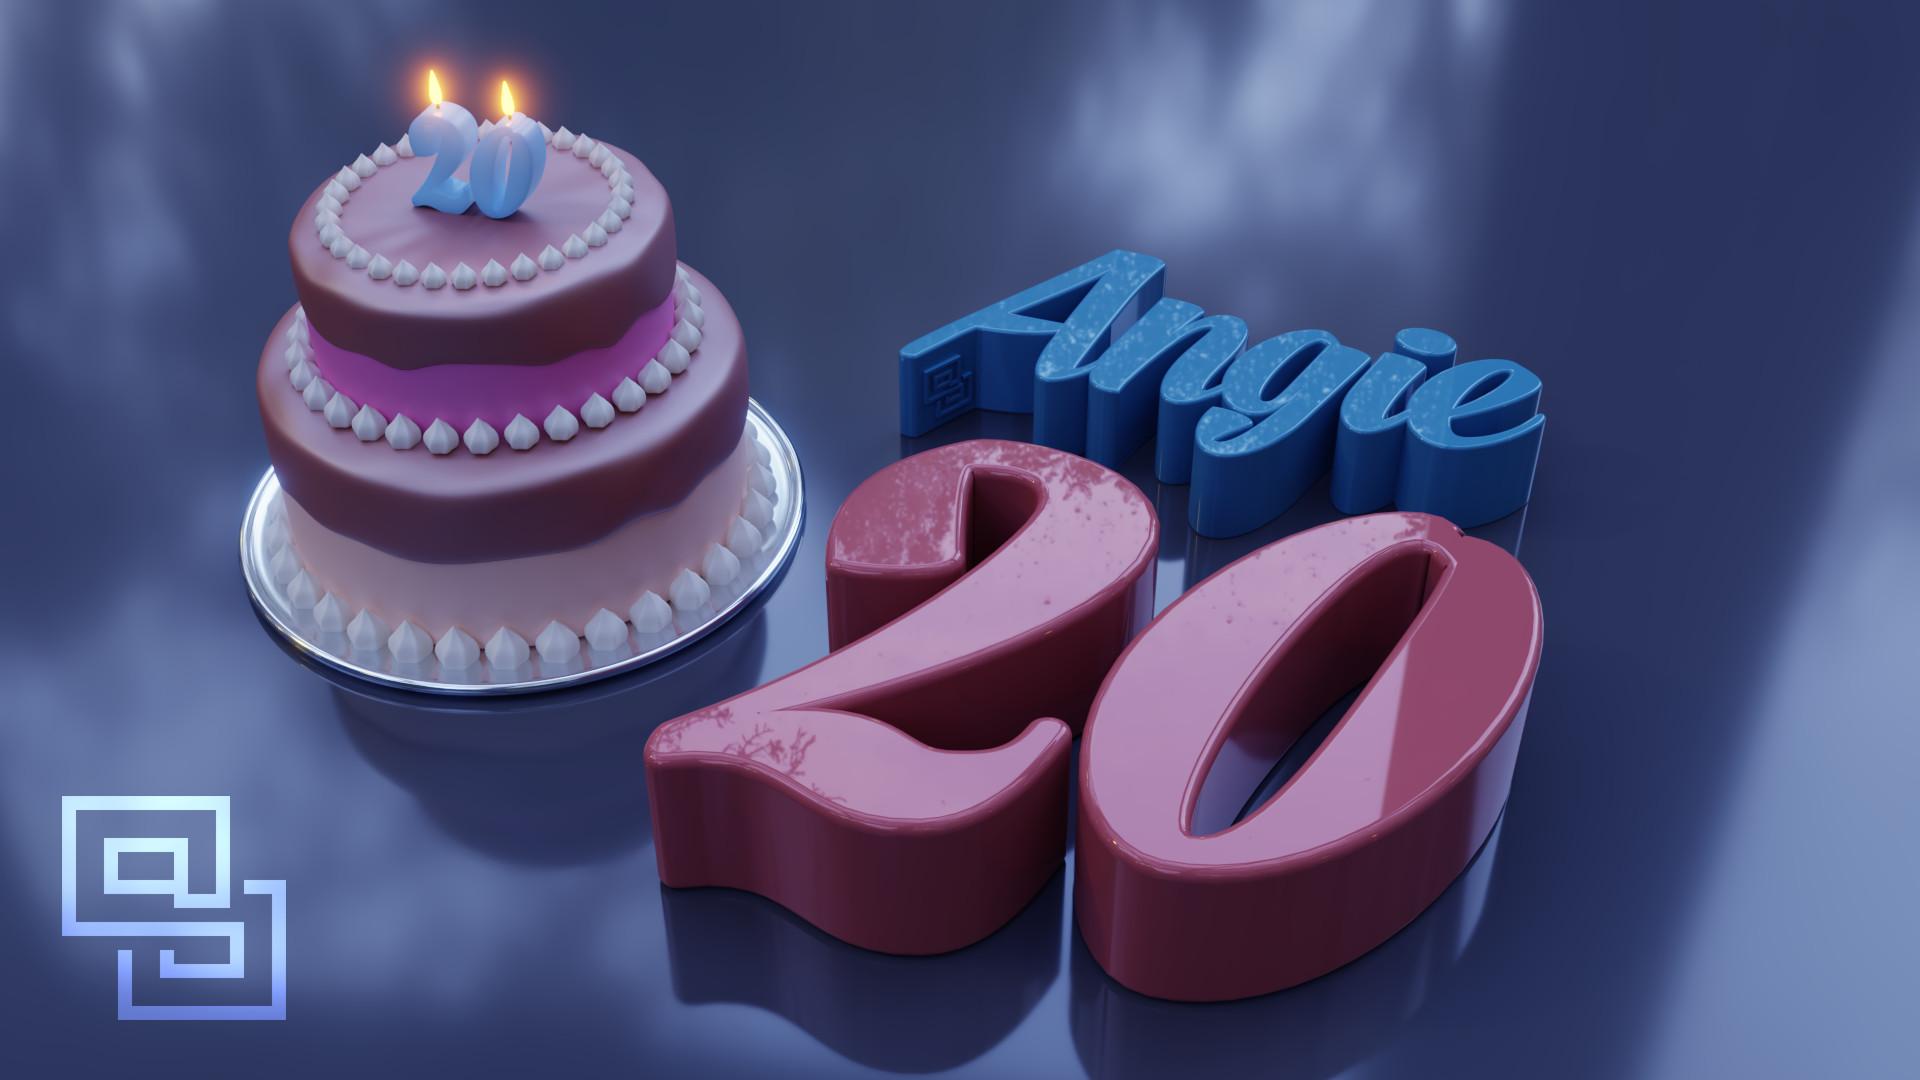 Luis Miguel Maldonado Happy Birthday 2018 Angie